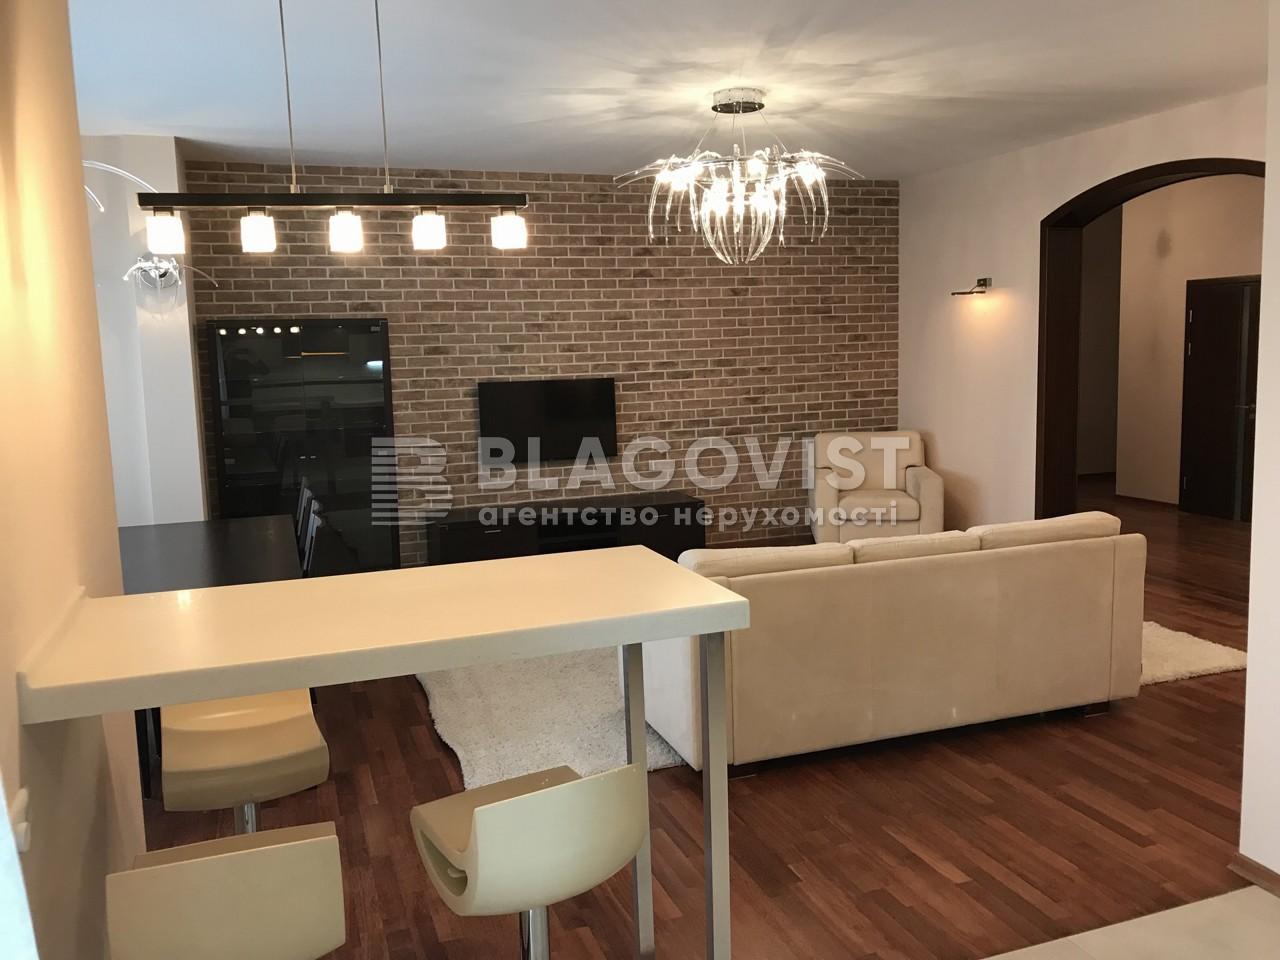 Квартира A-73479, Коновальца Евгения (Щорса), 32а, Киев - Фото 1